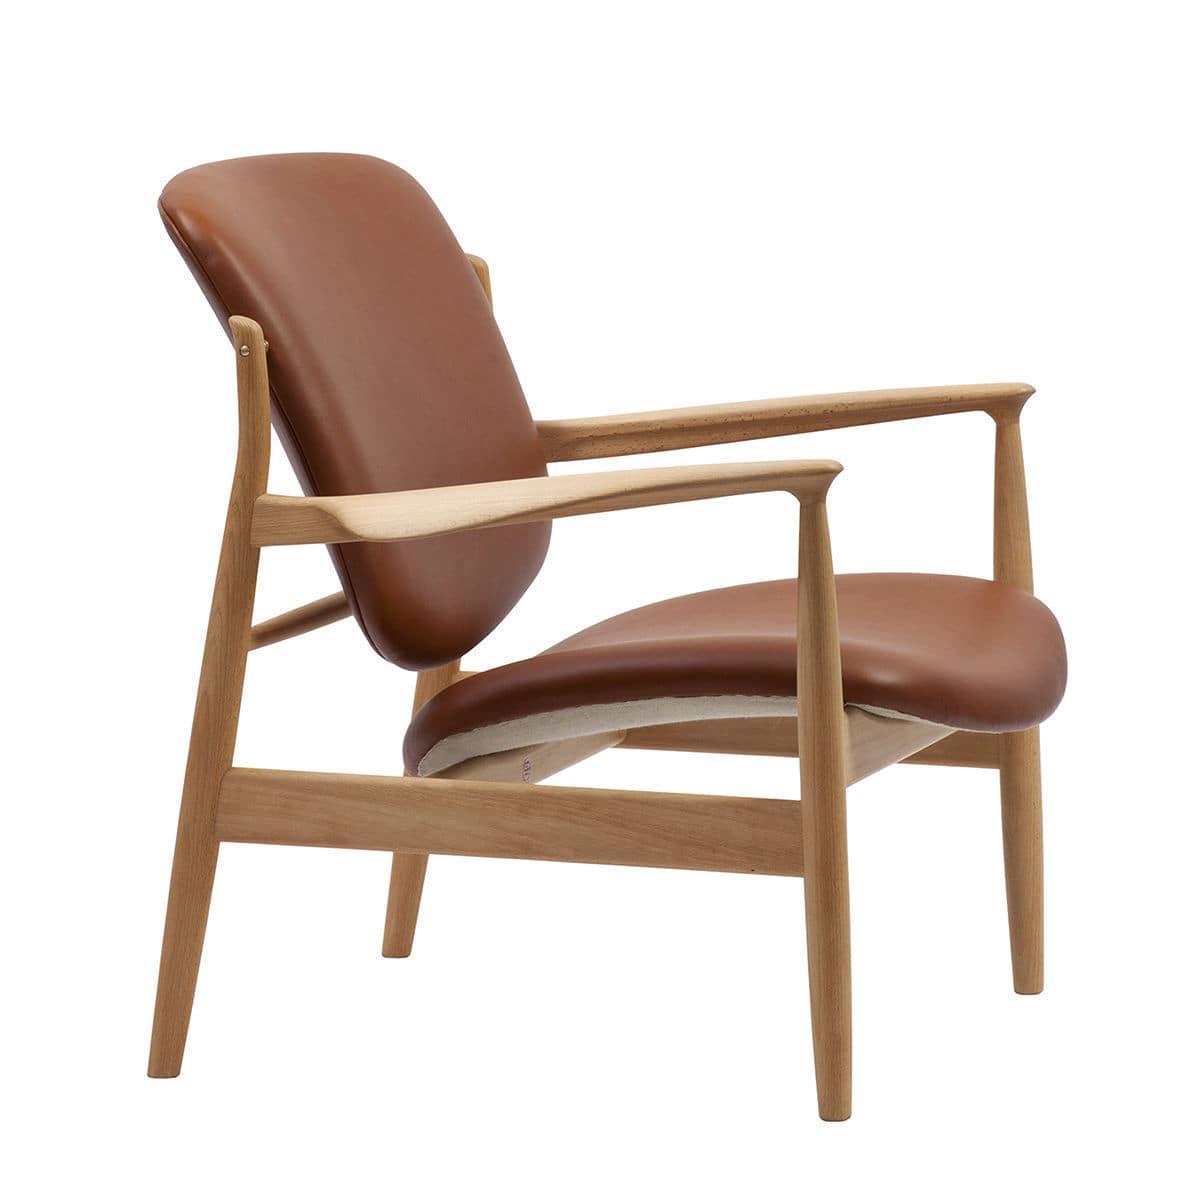 Sessel / Skandinavisches Design / Holz / Stoff / Leder - FRANCE ...